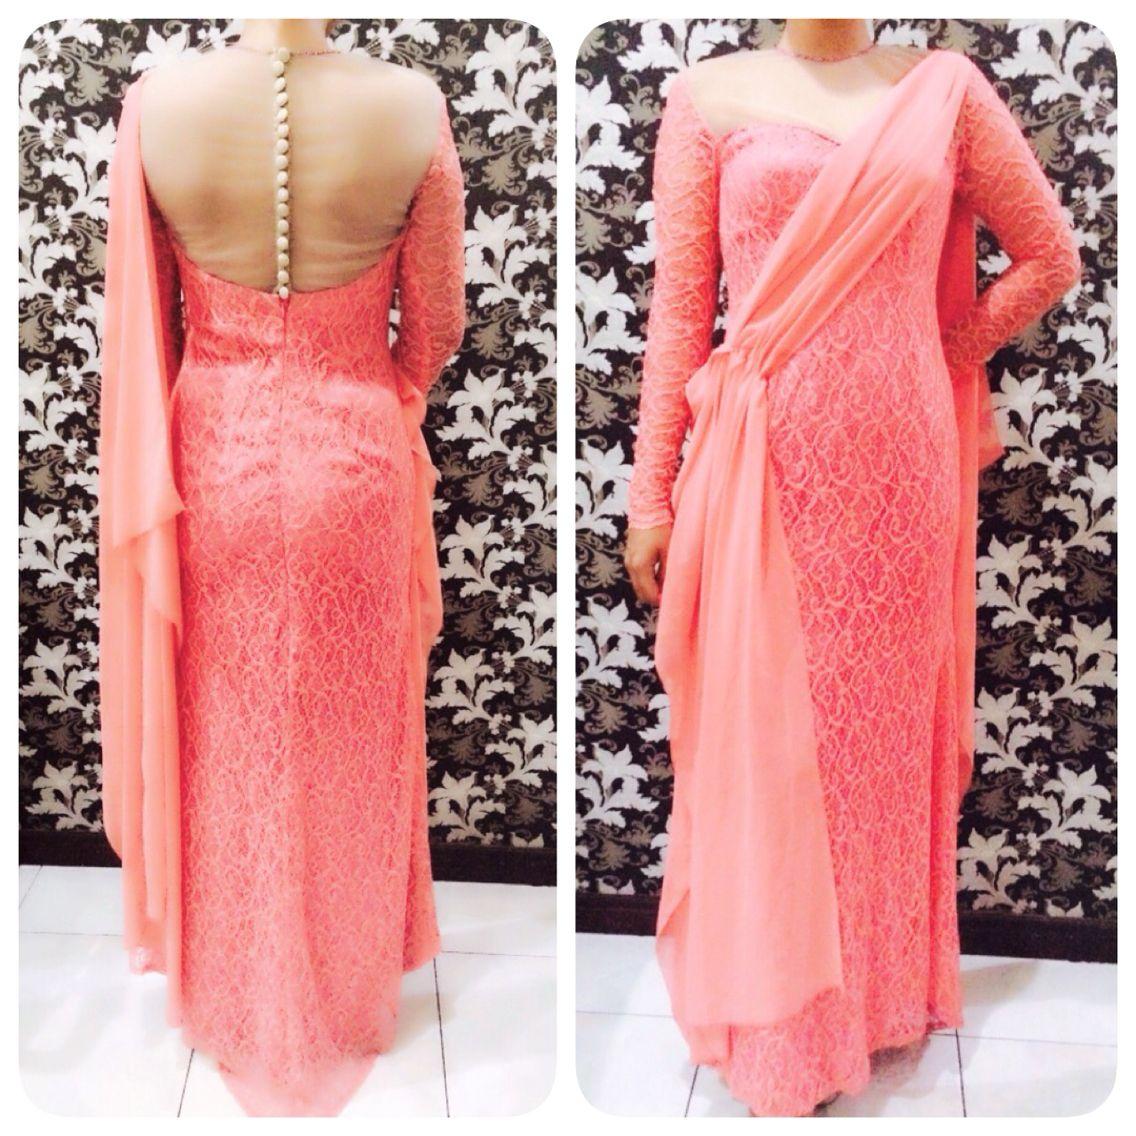 Peach Dresses #peach #dresses | Dress Up | Pinterest